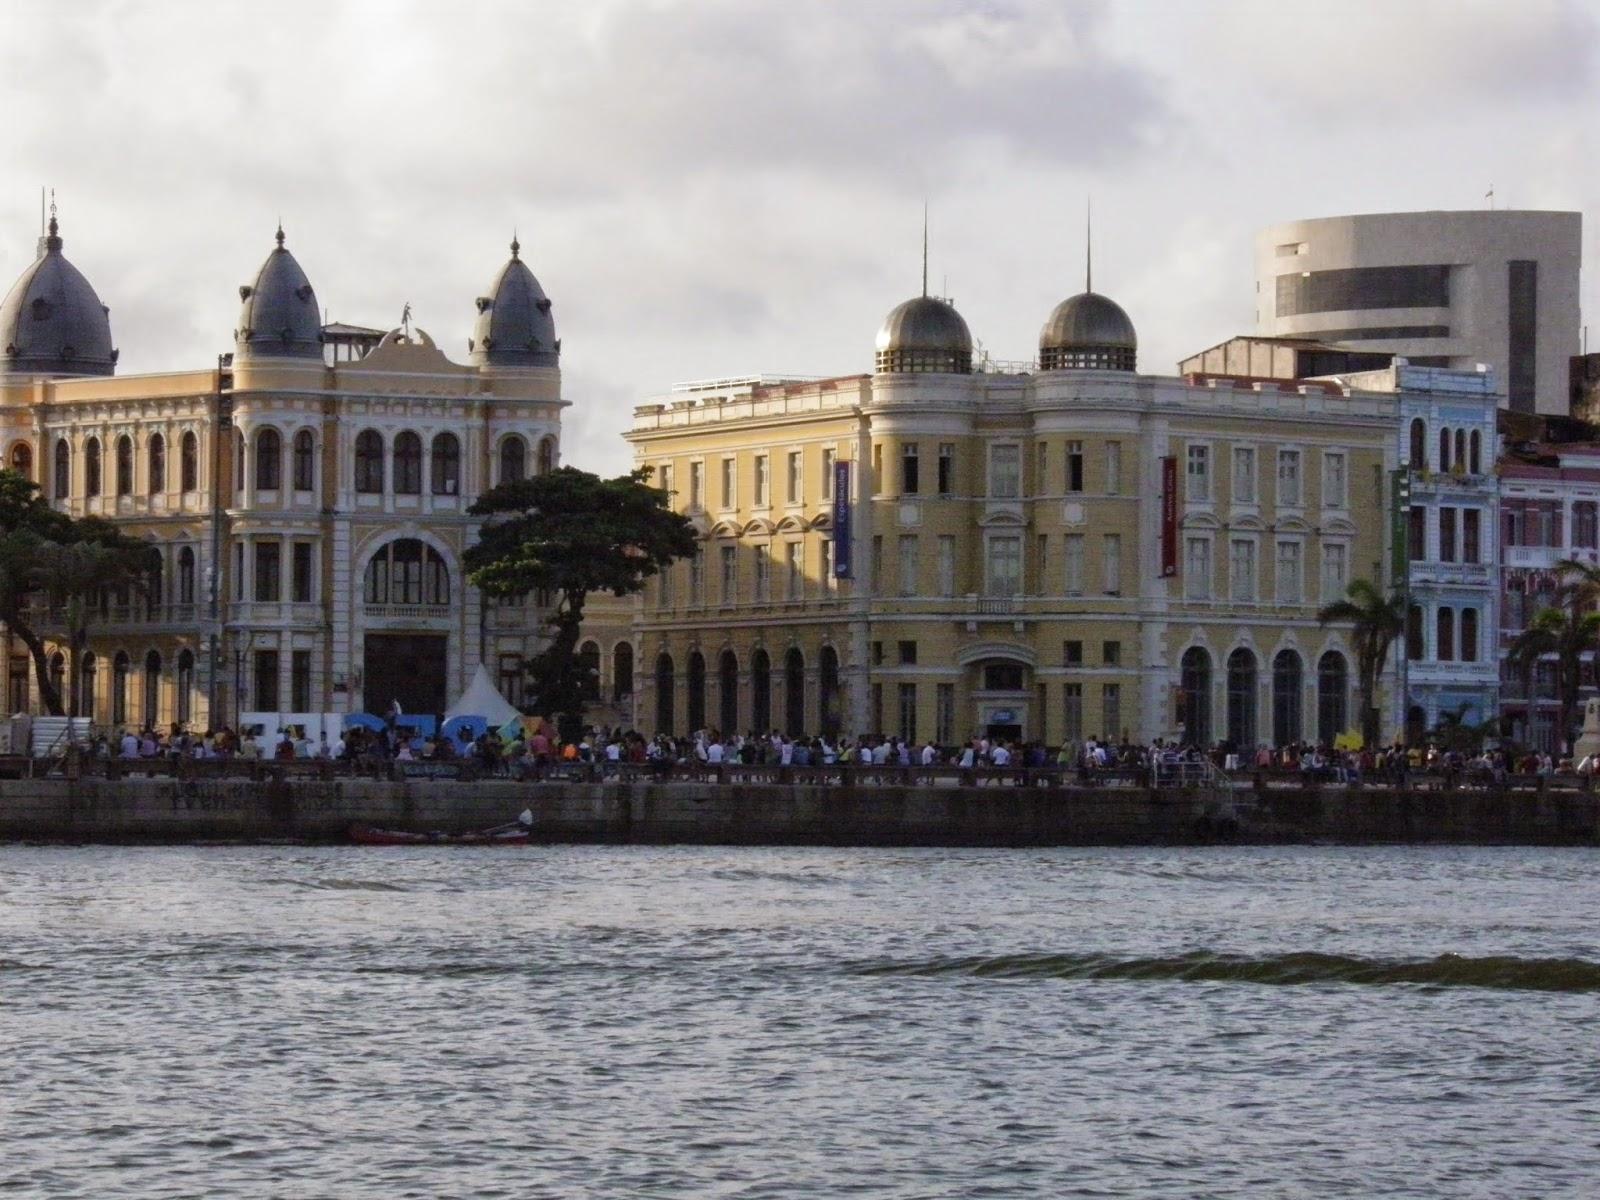 RECIFE; TURISMO; PASSEIO DE BARCO; PASSEIO DE CATAMARÃ; RIO CAPIBARIBE; MARCO ZERO